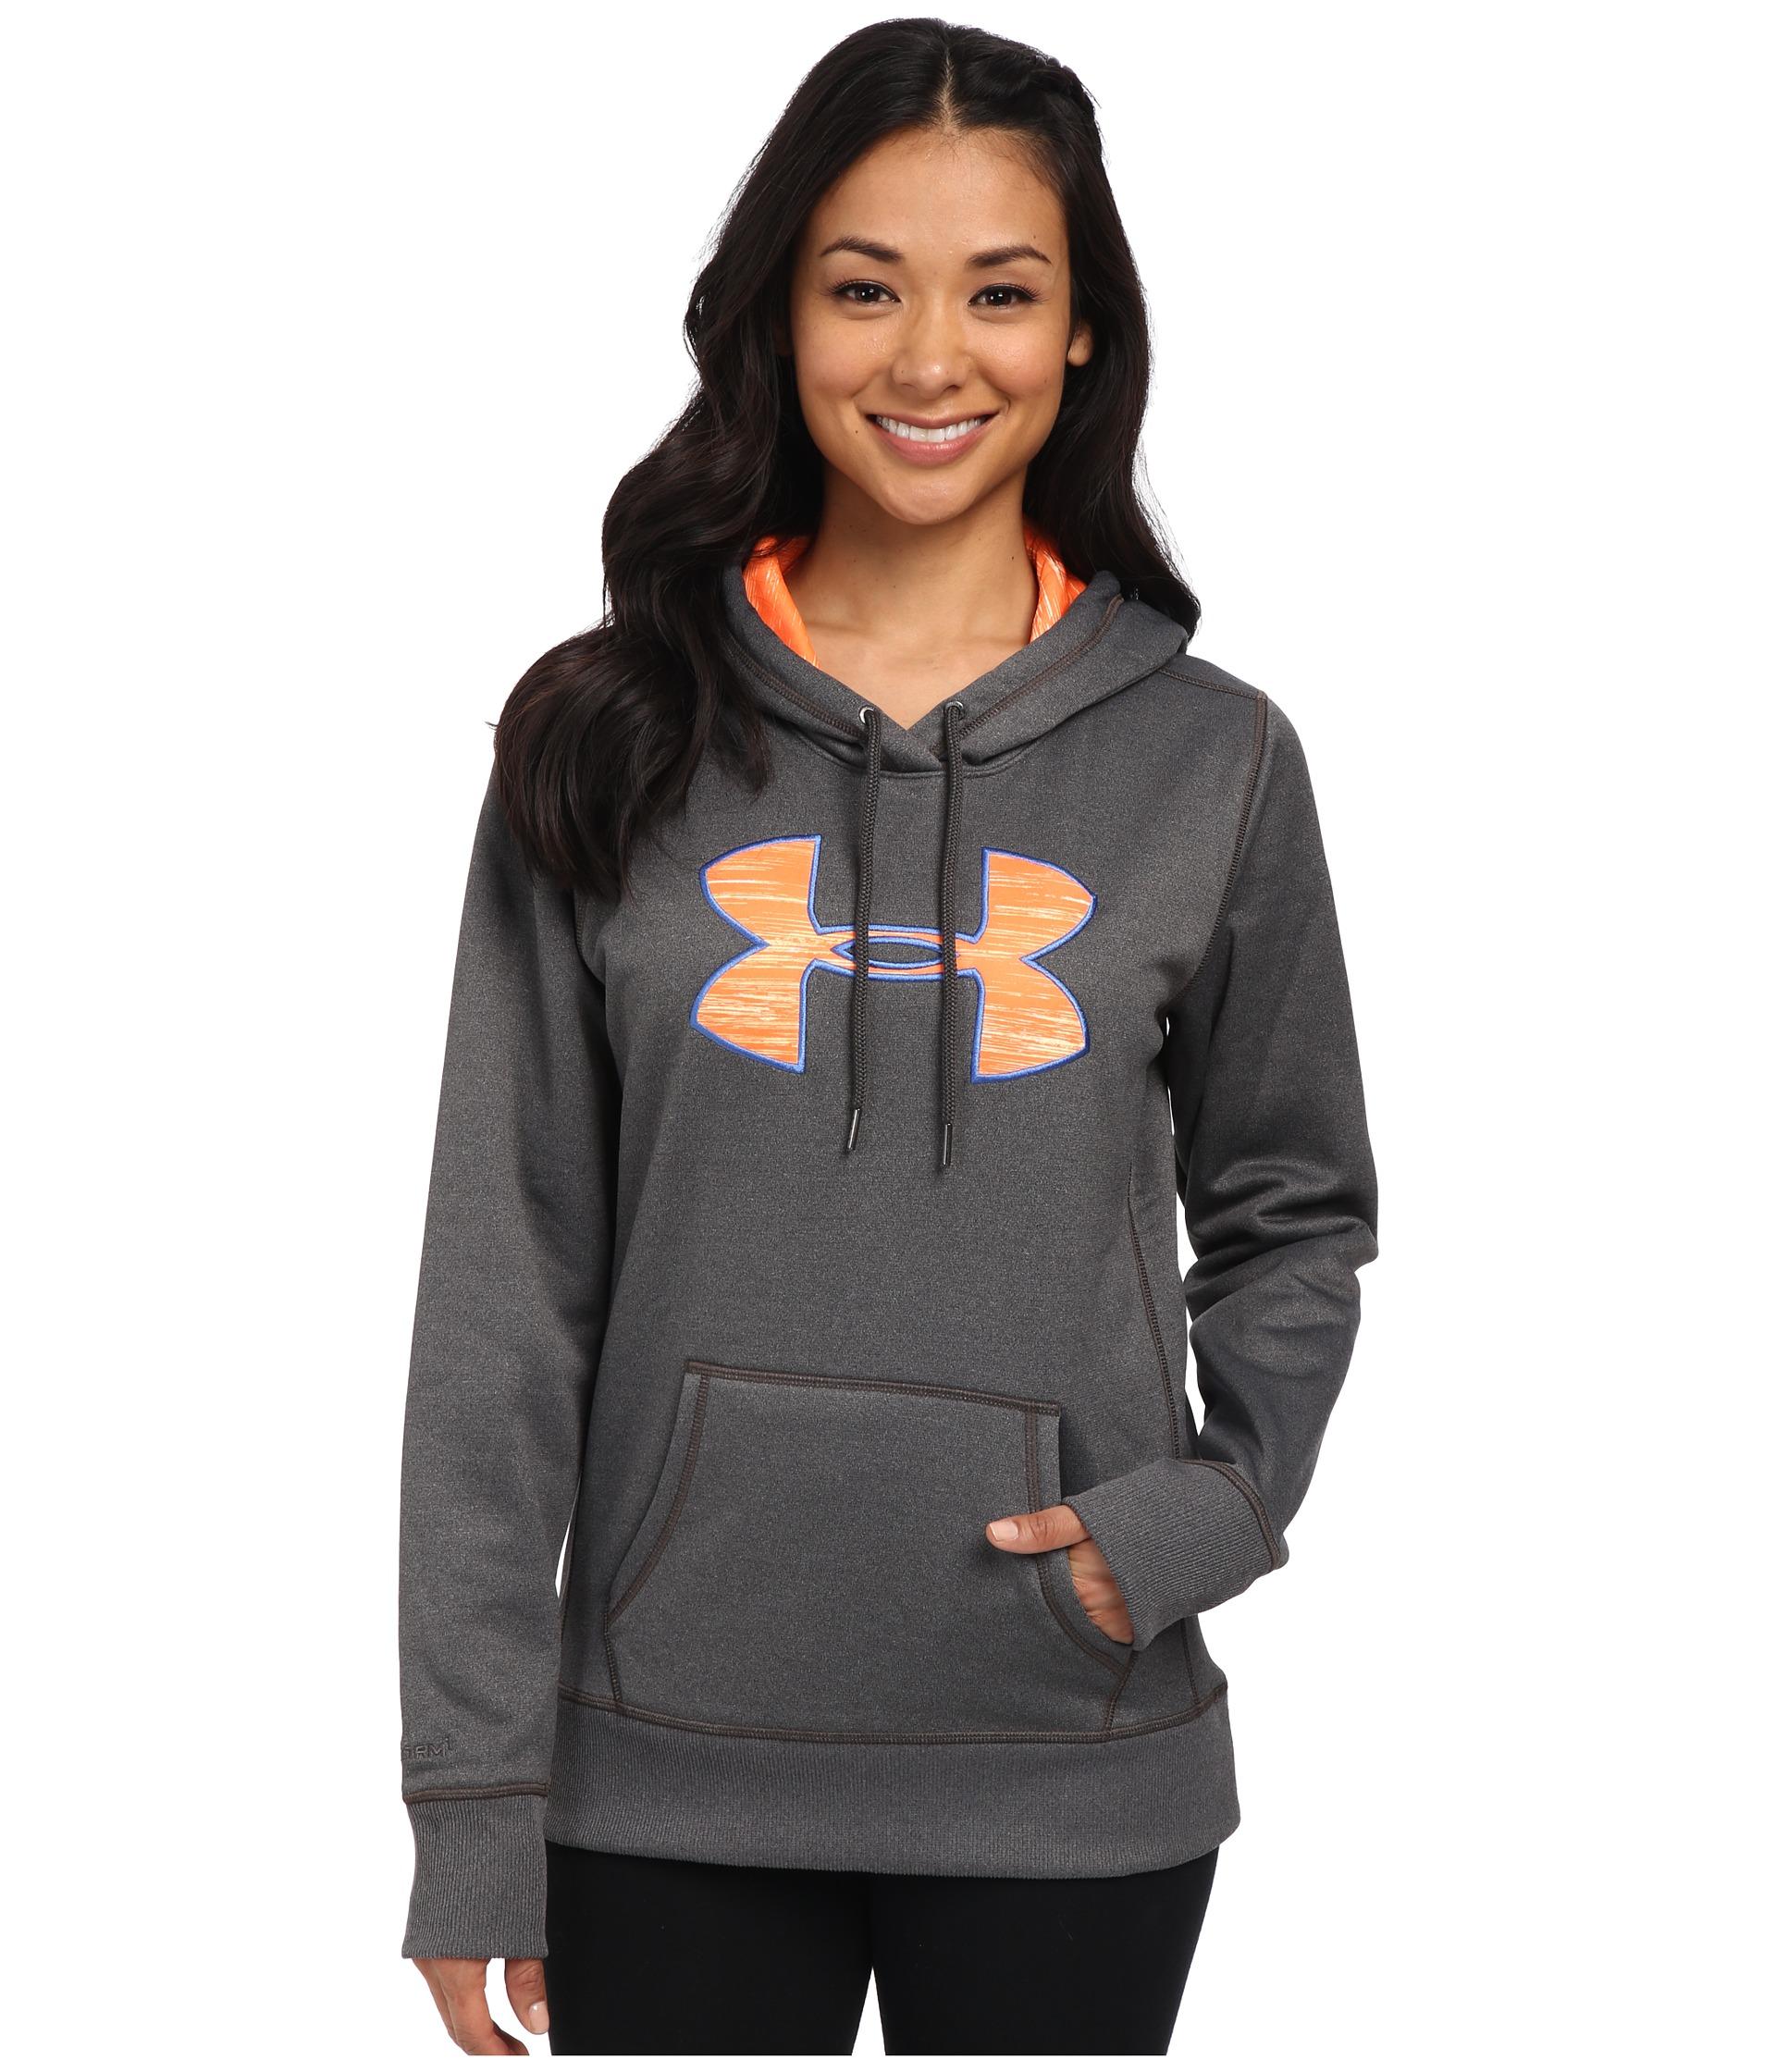 cheap under armour jackets women orange cdd1a3707